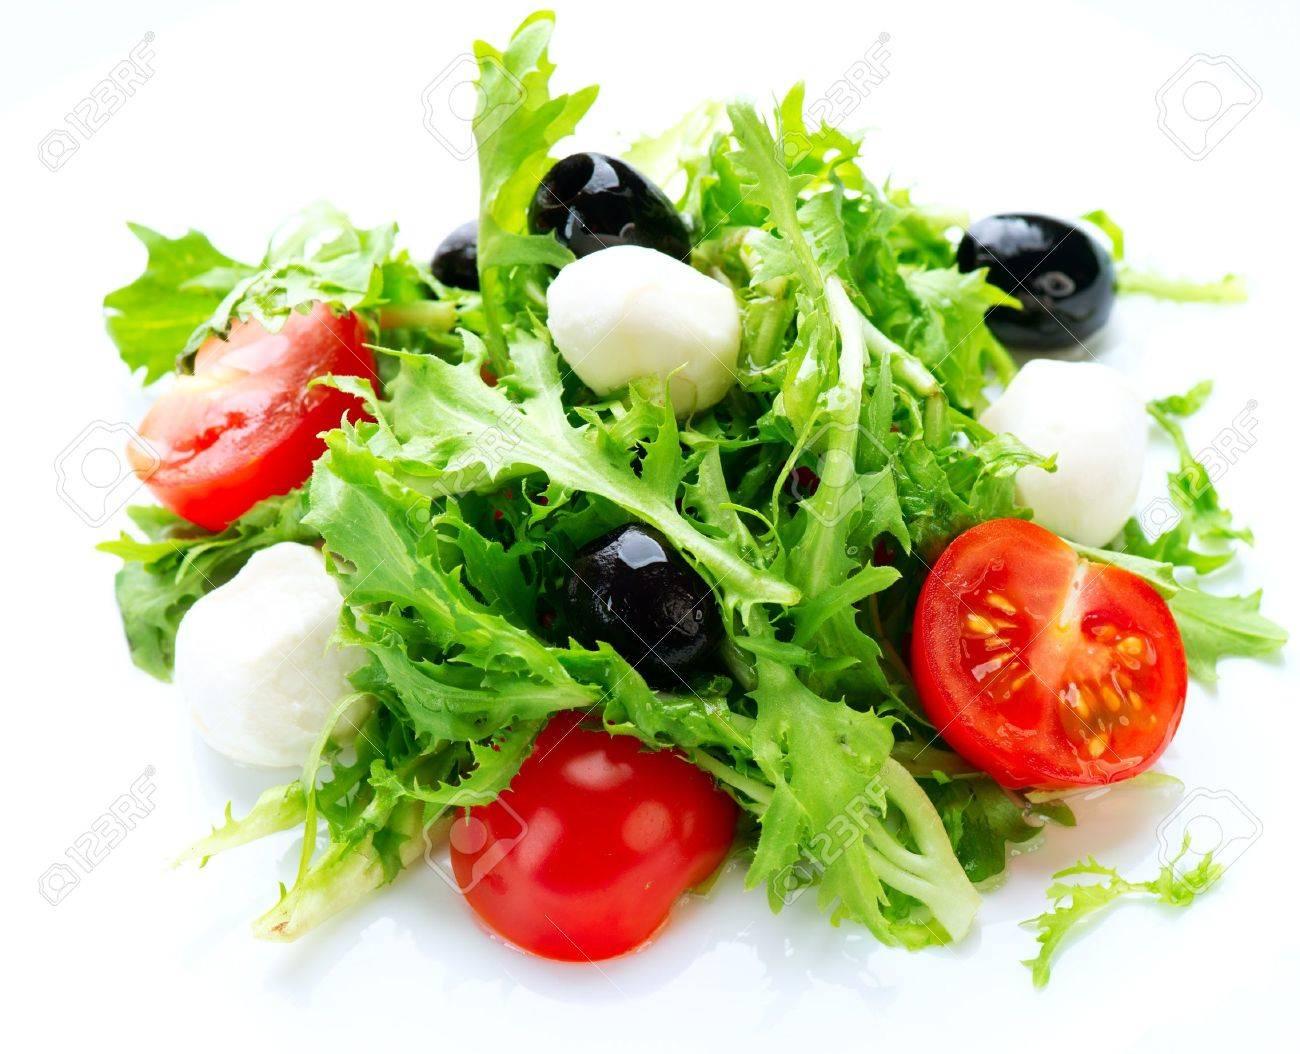 Salad with Mozzarella Cheese - 15057237